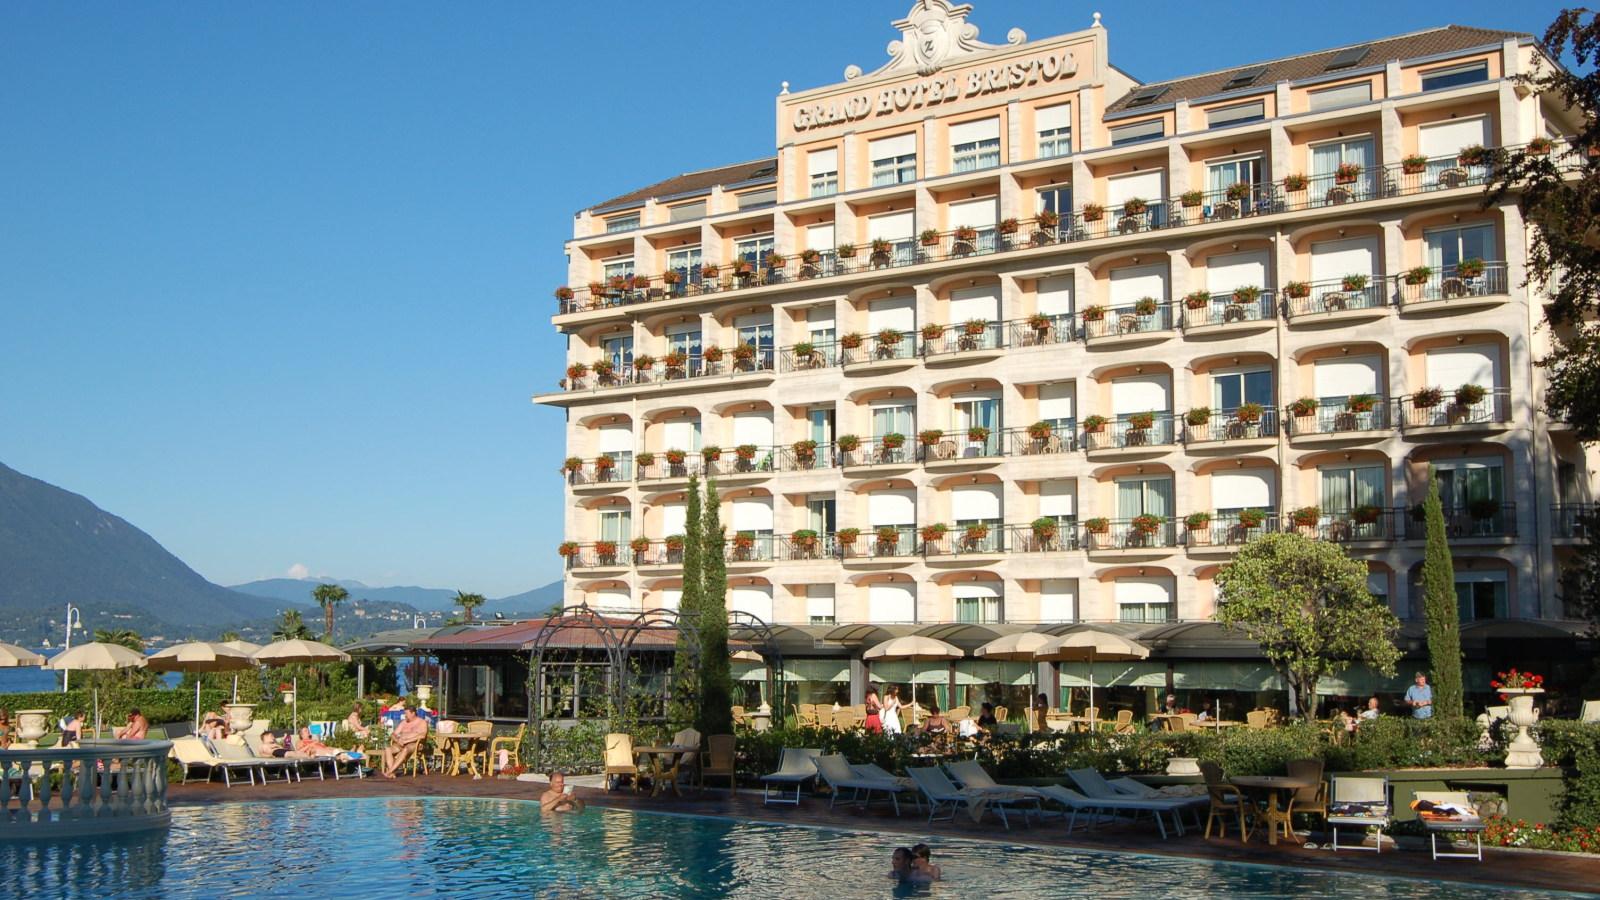 Grand hotel stresa topflight